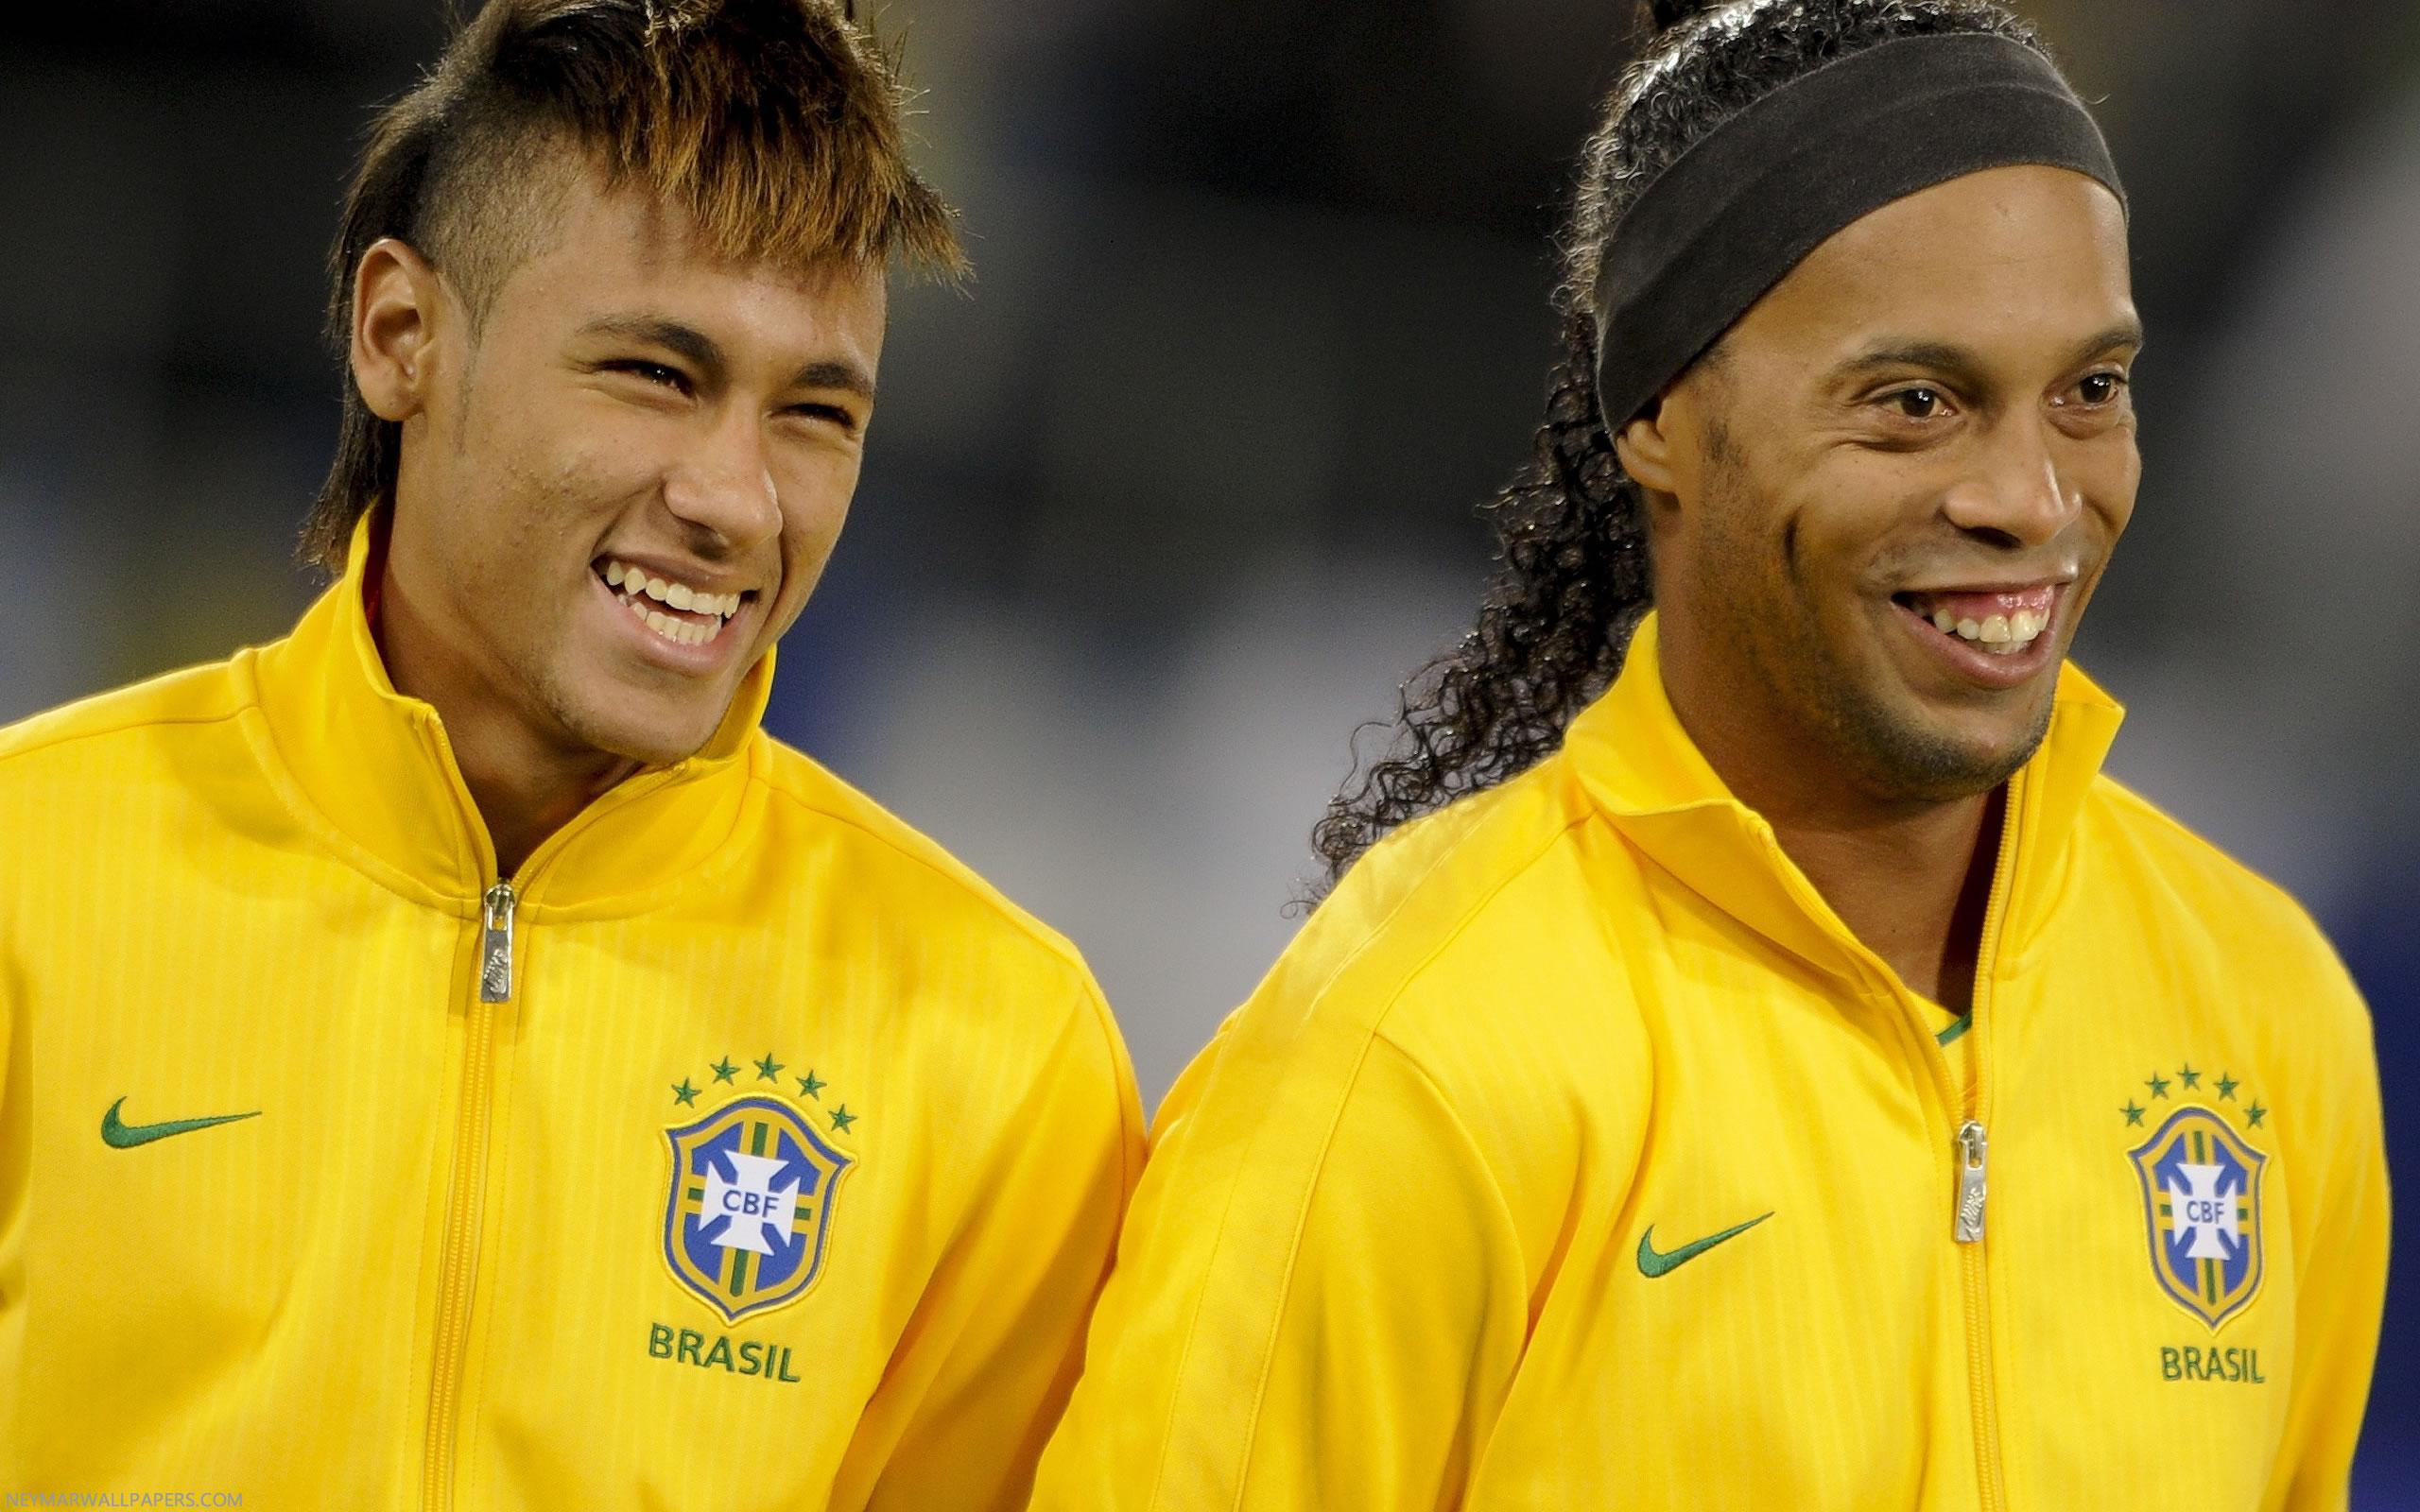 Neymar And Ronaldinho - Ronaldinho 2002 Fifa World Cup , HD Wallpaper & Backgrounds